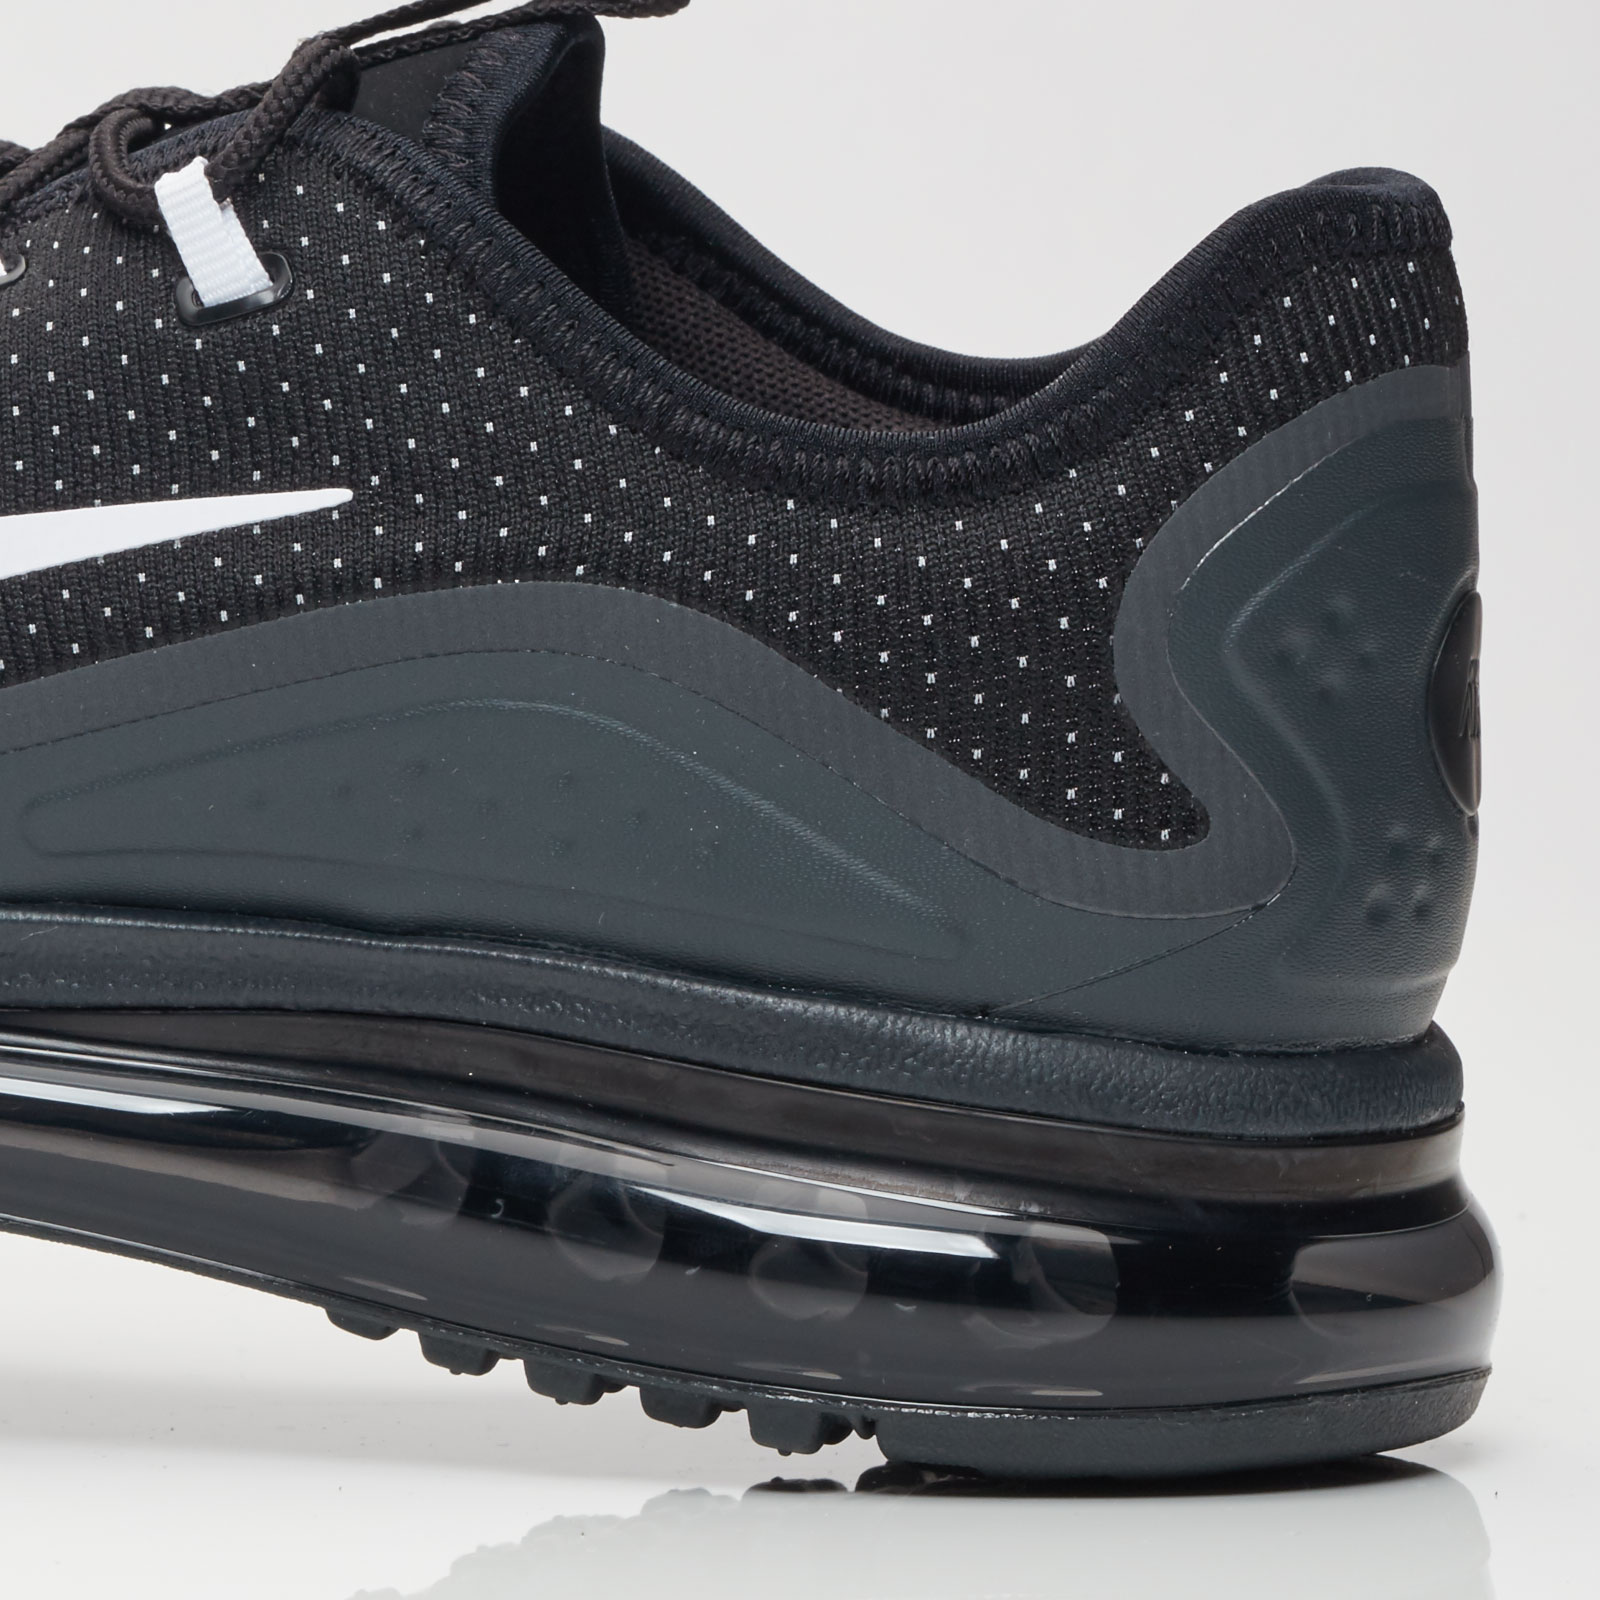 Nike Air Max More 898013 001 Sneakersnstuff I Sneakers